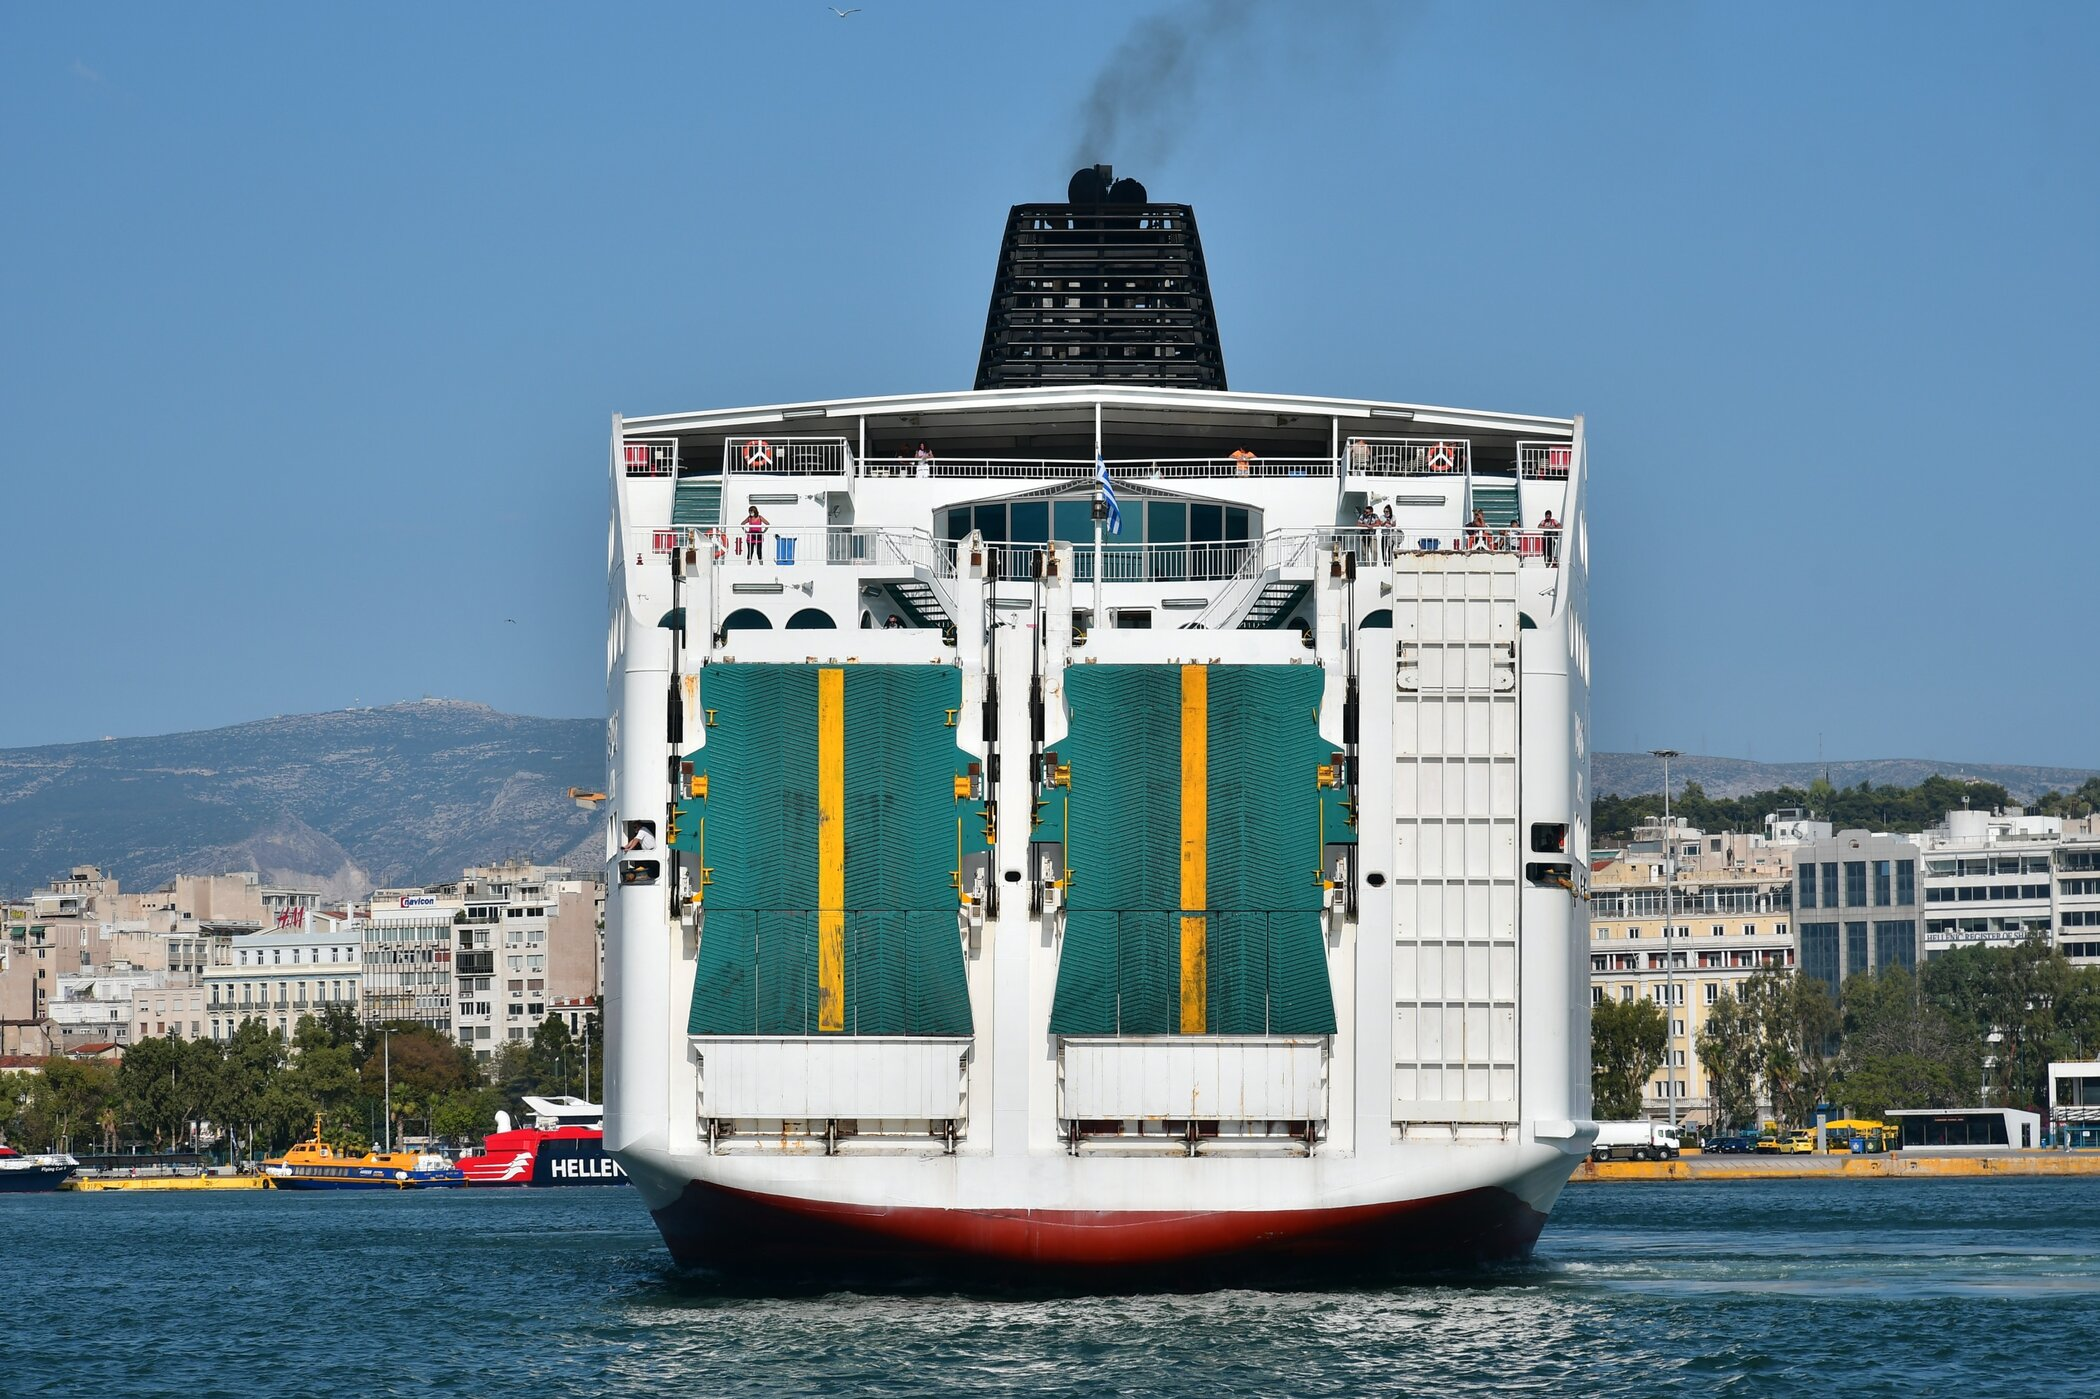 Elyros_02-08-20_Piraeus_3